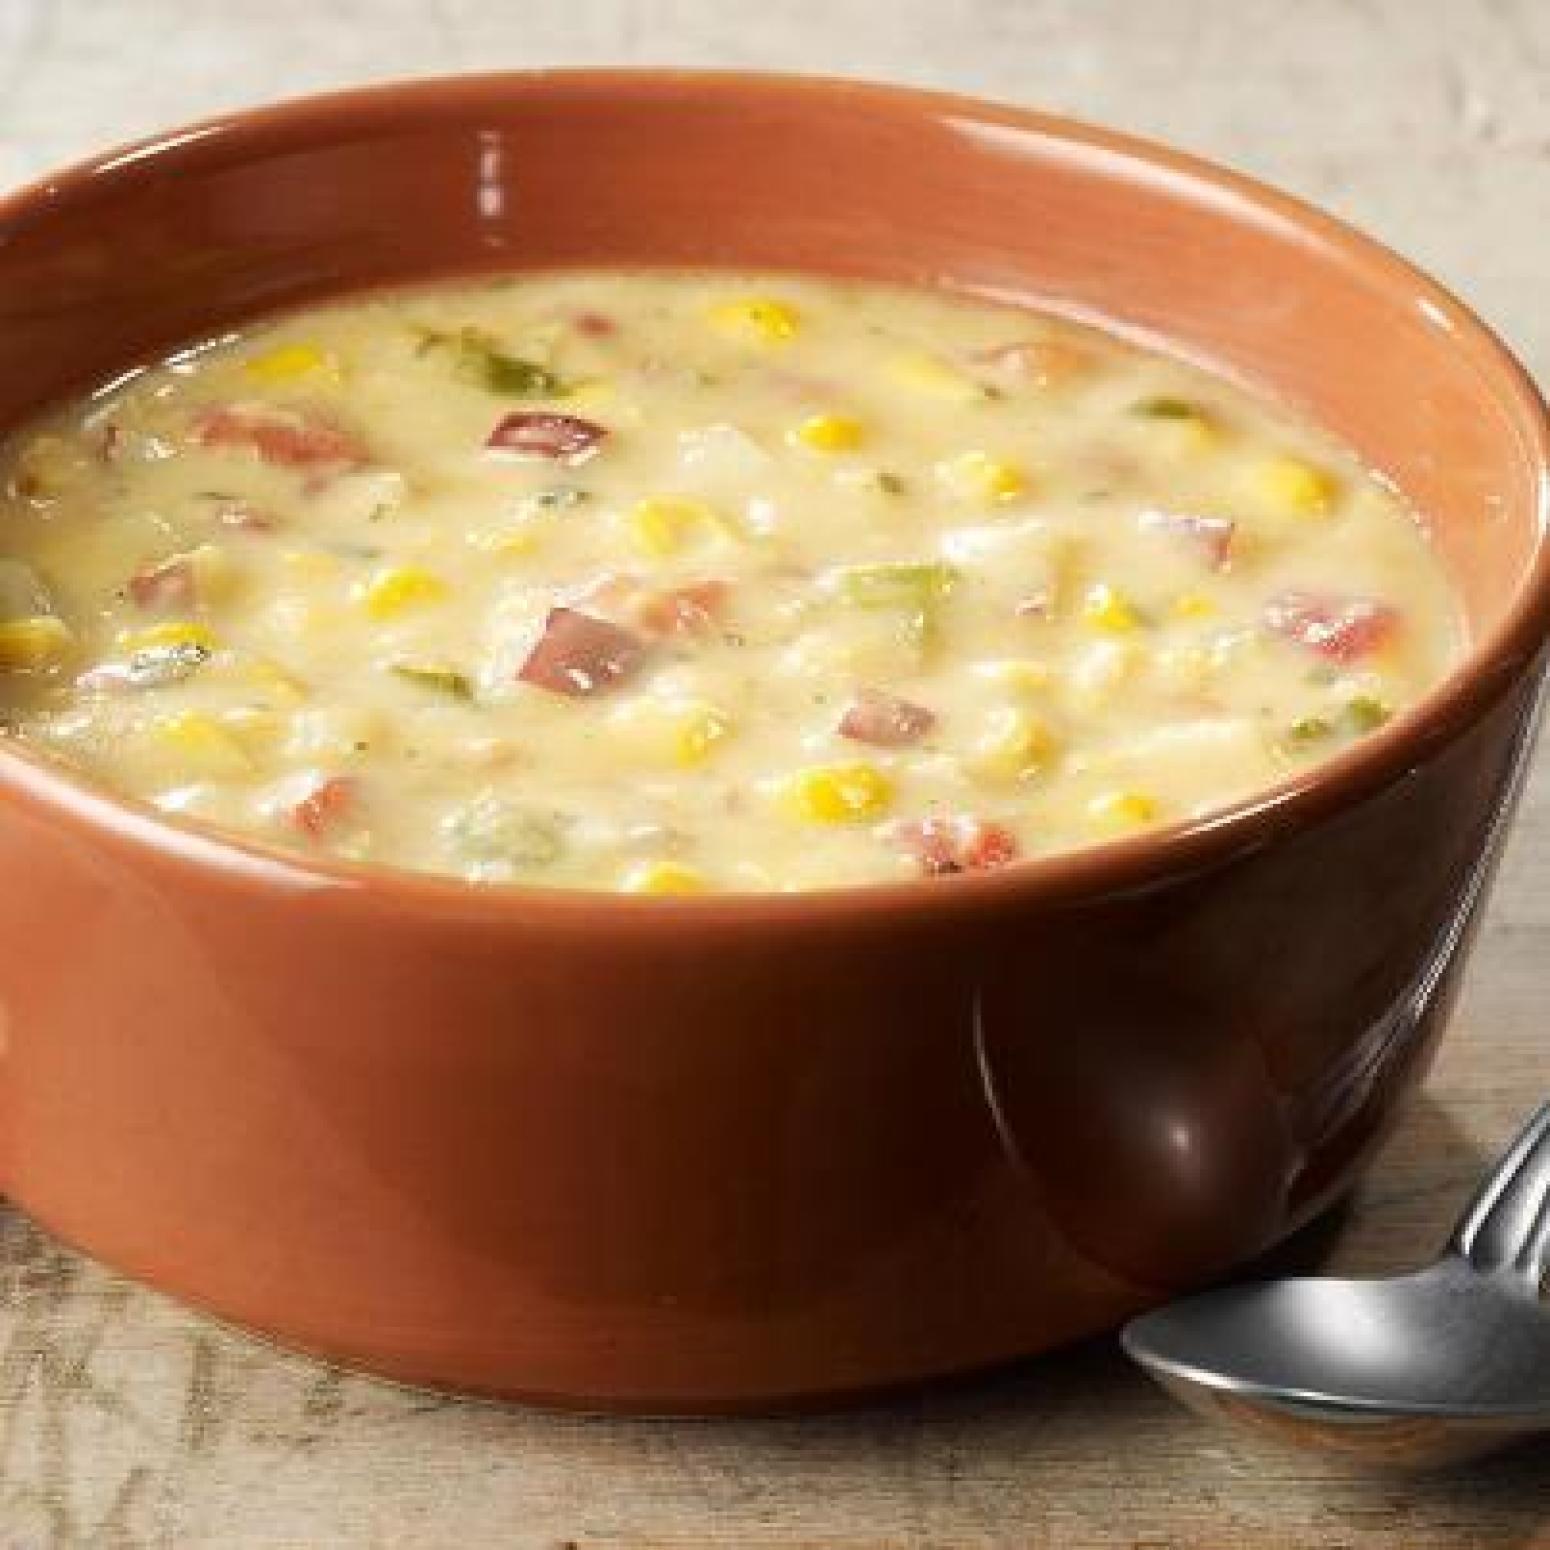 Summer Corn Chowder Panera  Panera Bread Summer Corn Chowder Copycat Recipe